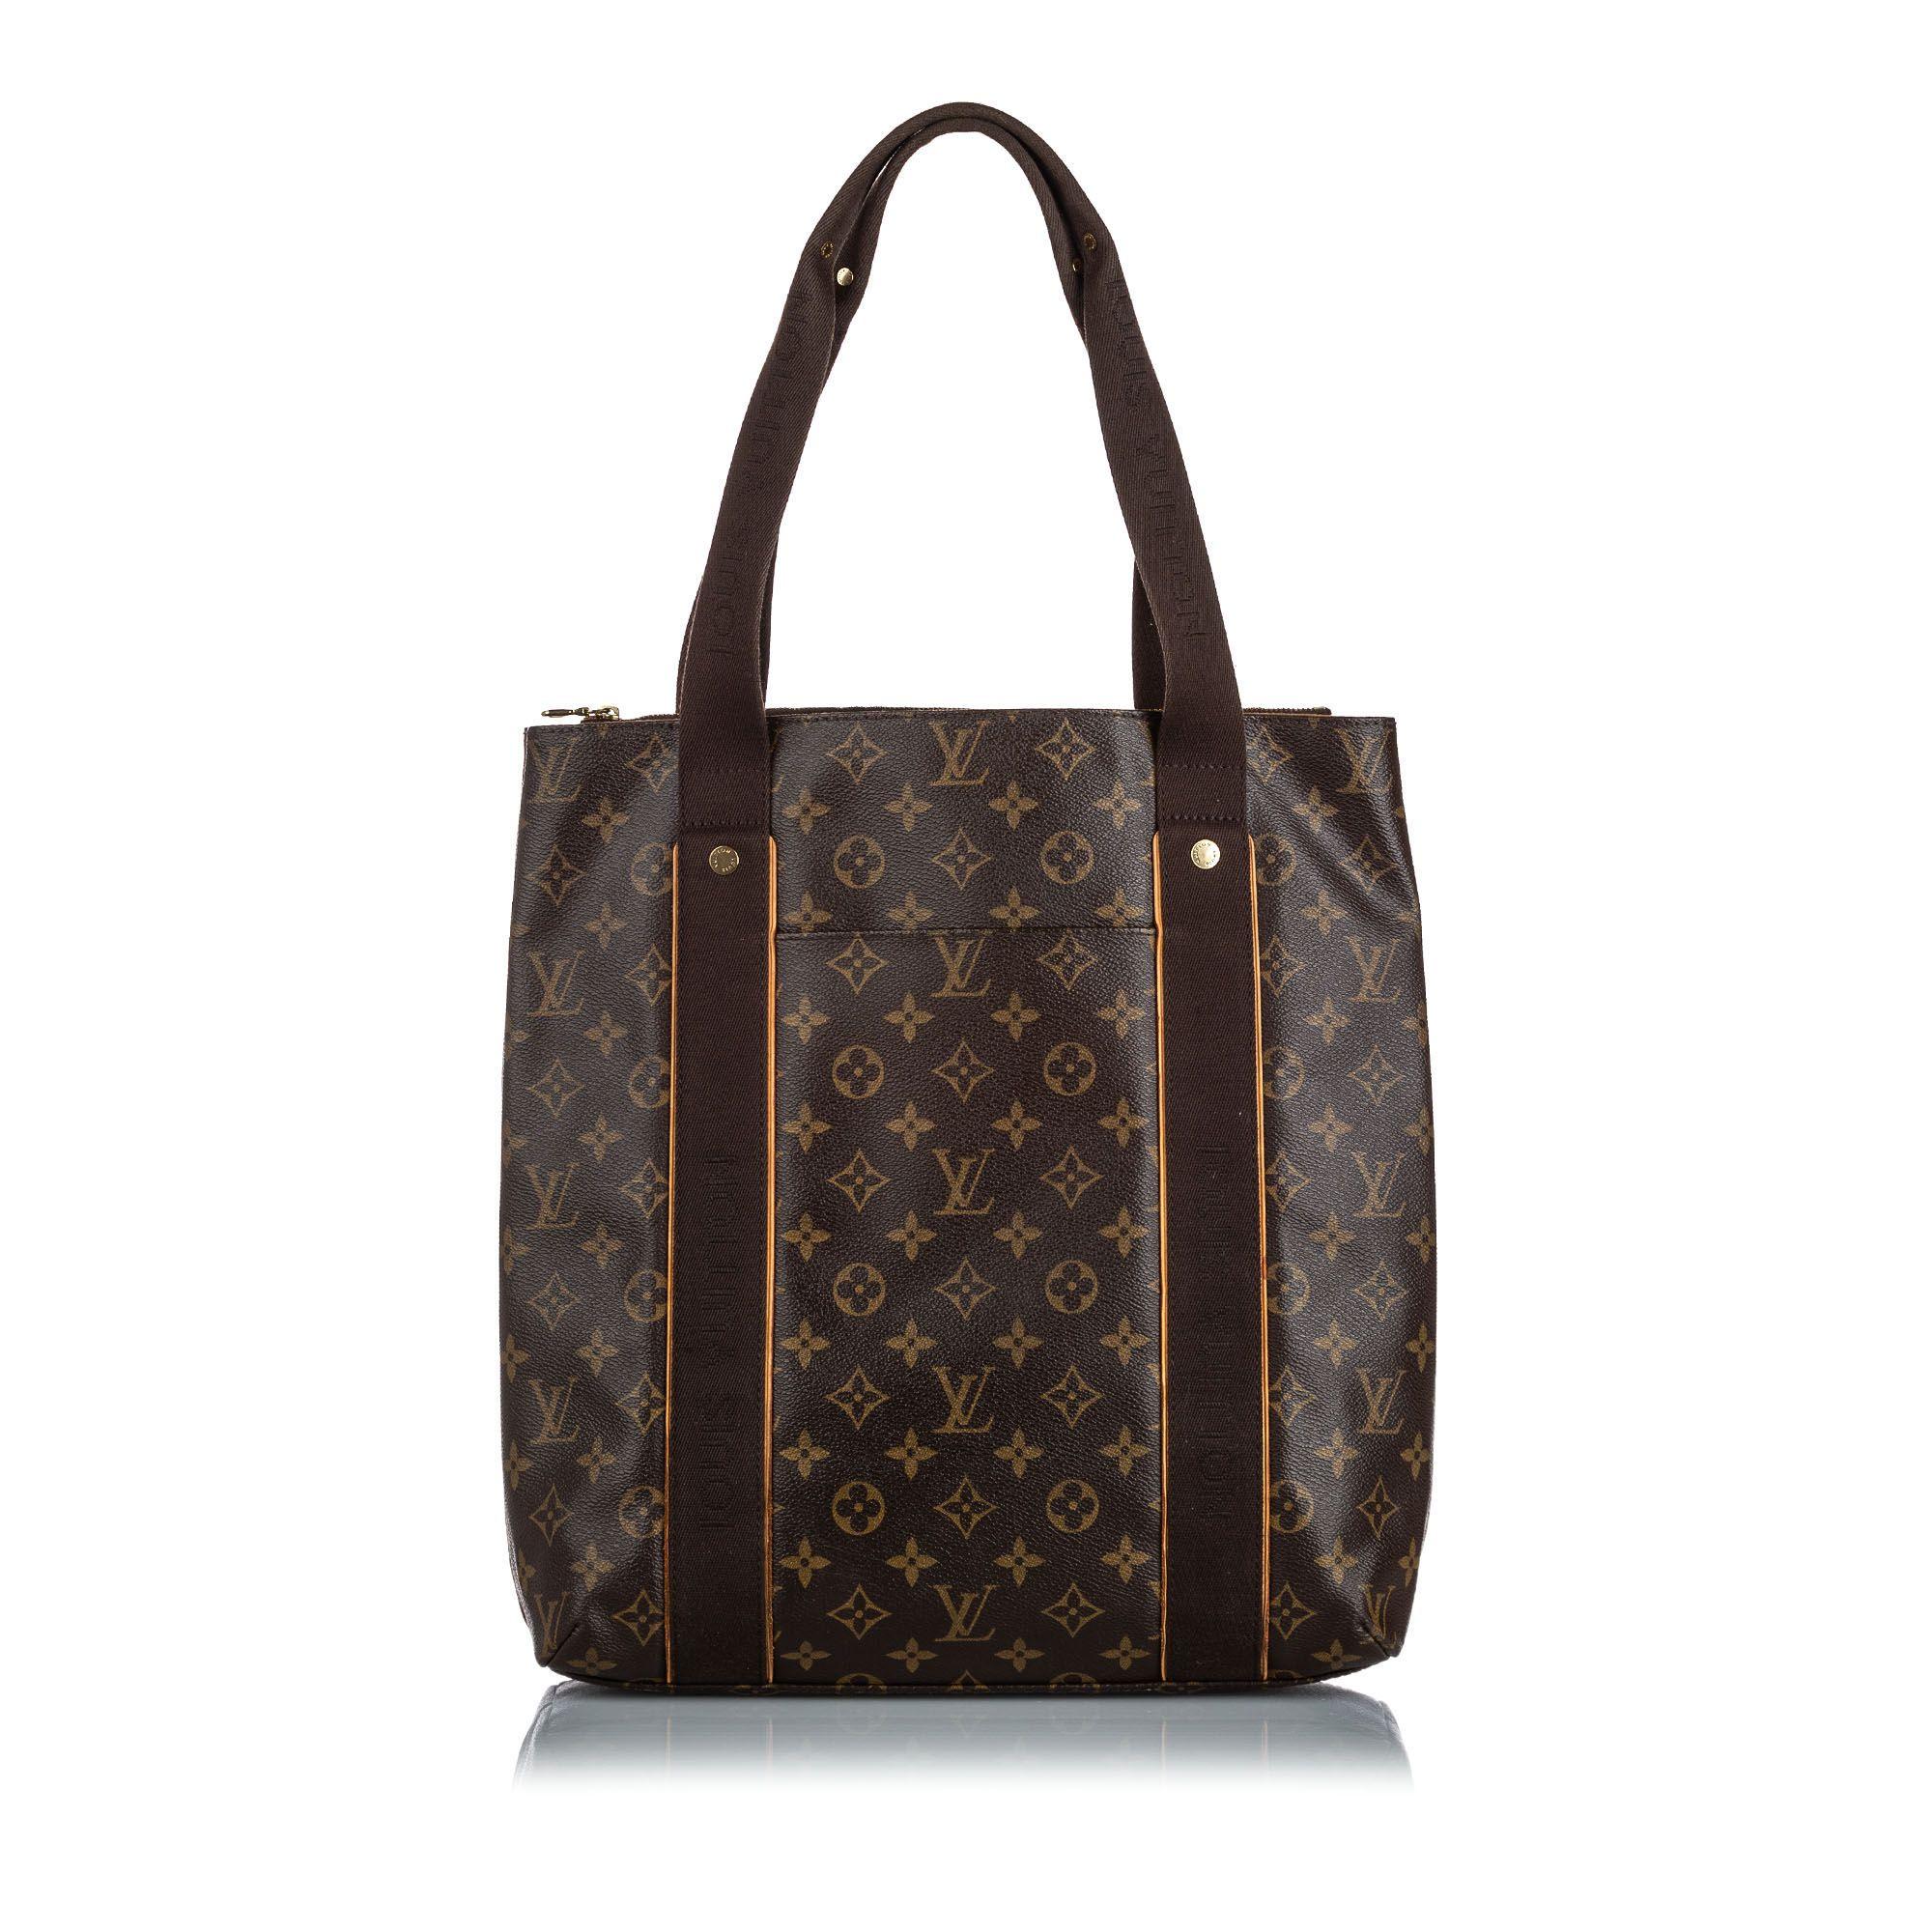 Vintage Louis Vuitton Monogram Beaubourg Brown